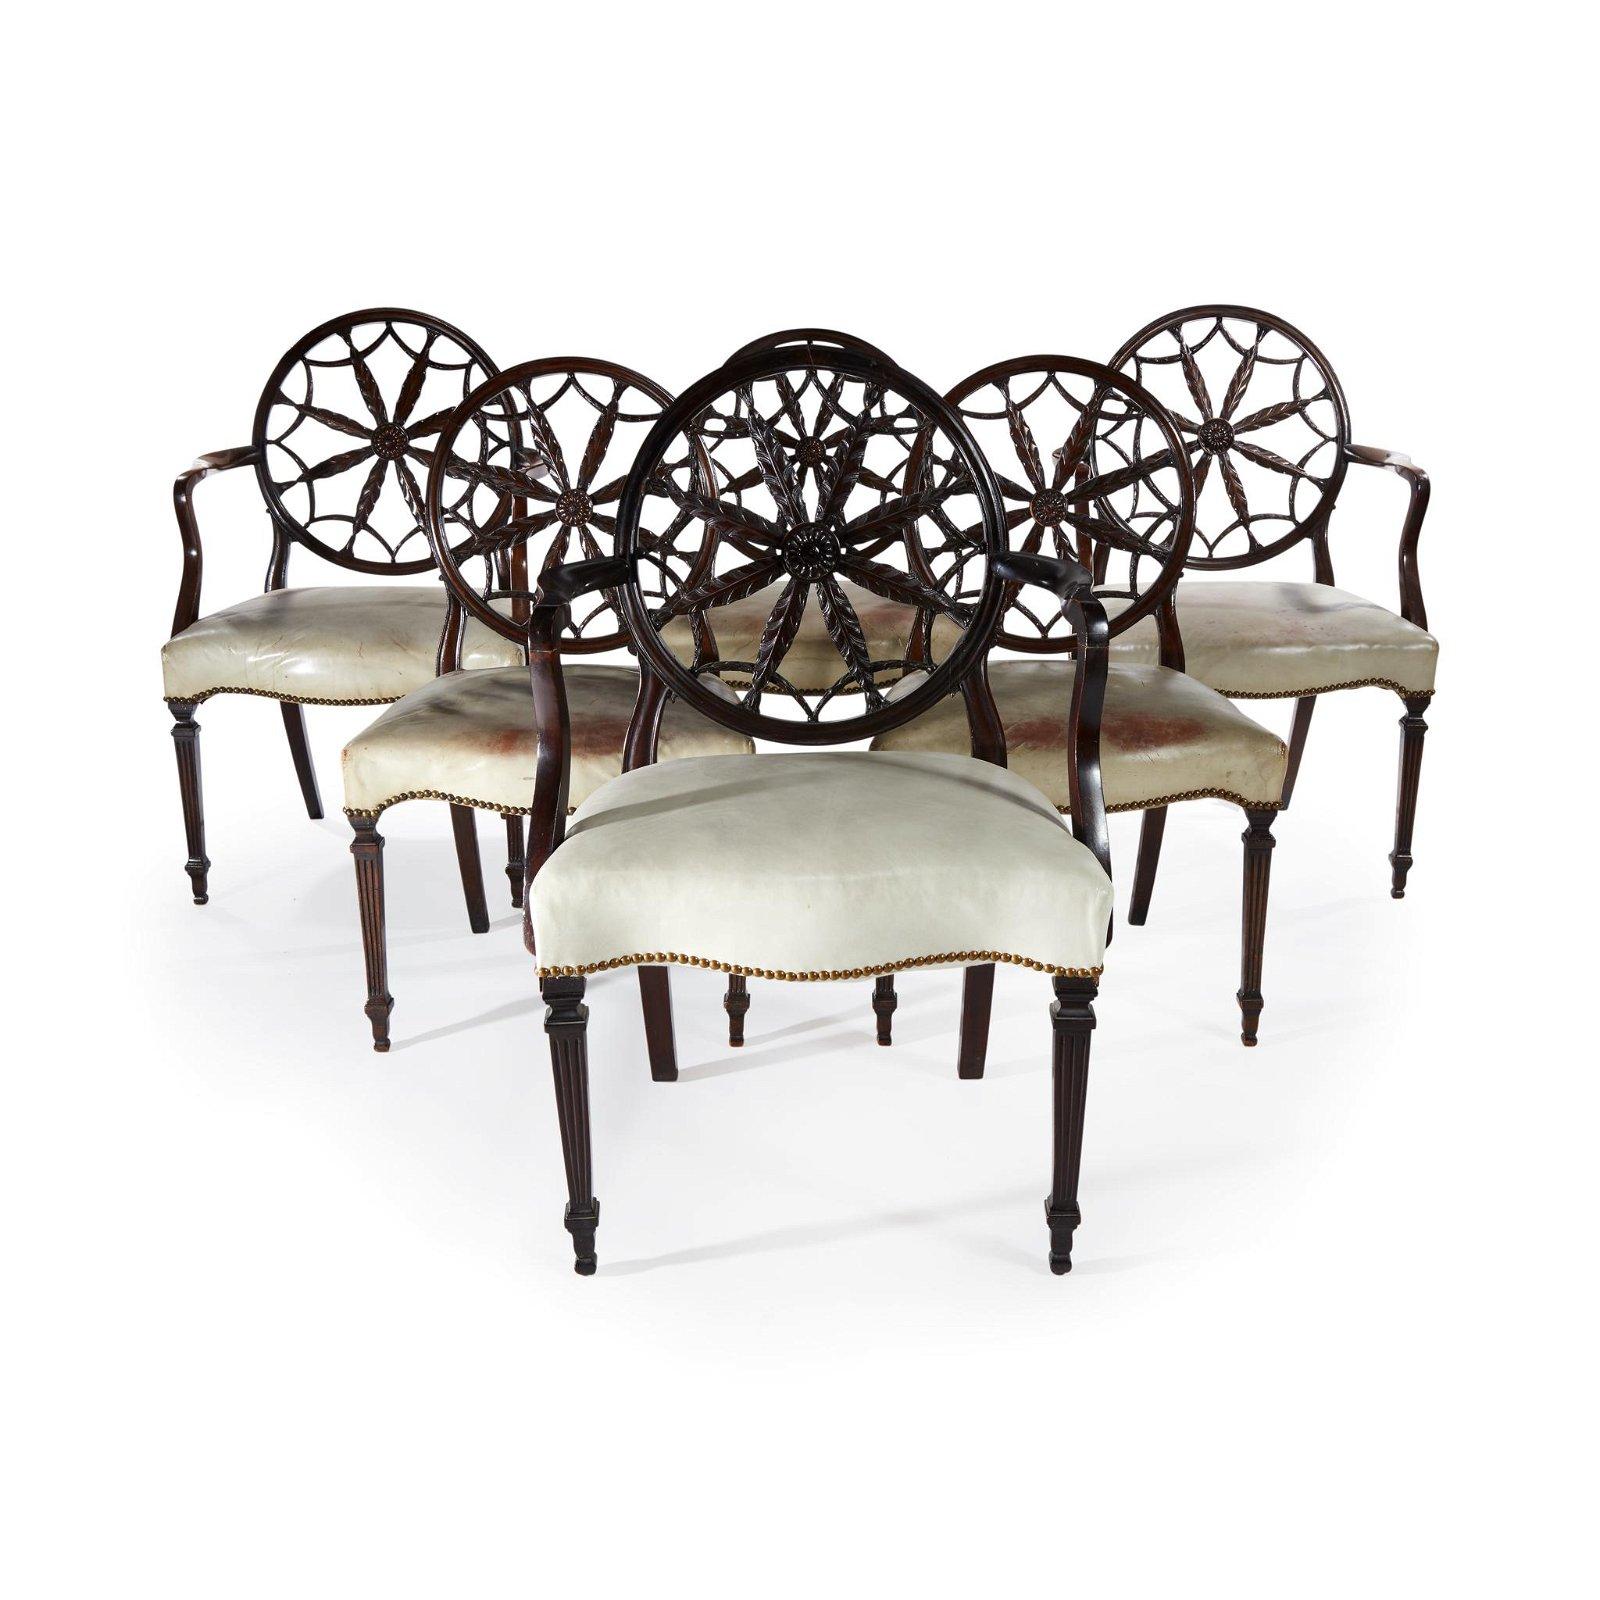 A set of twelve George III style carved mahogany wheel